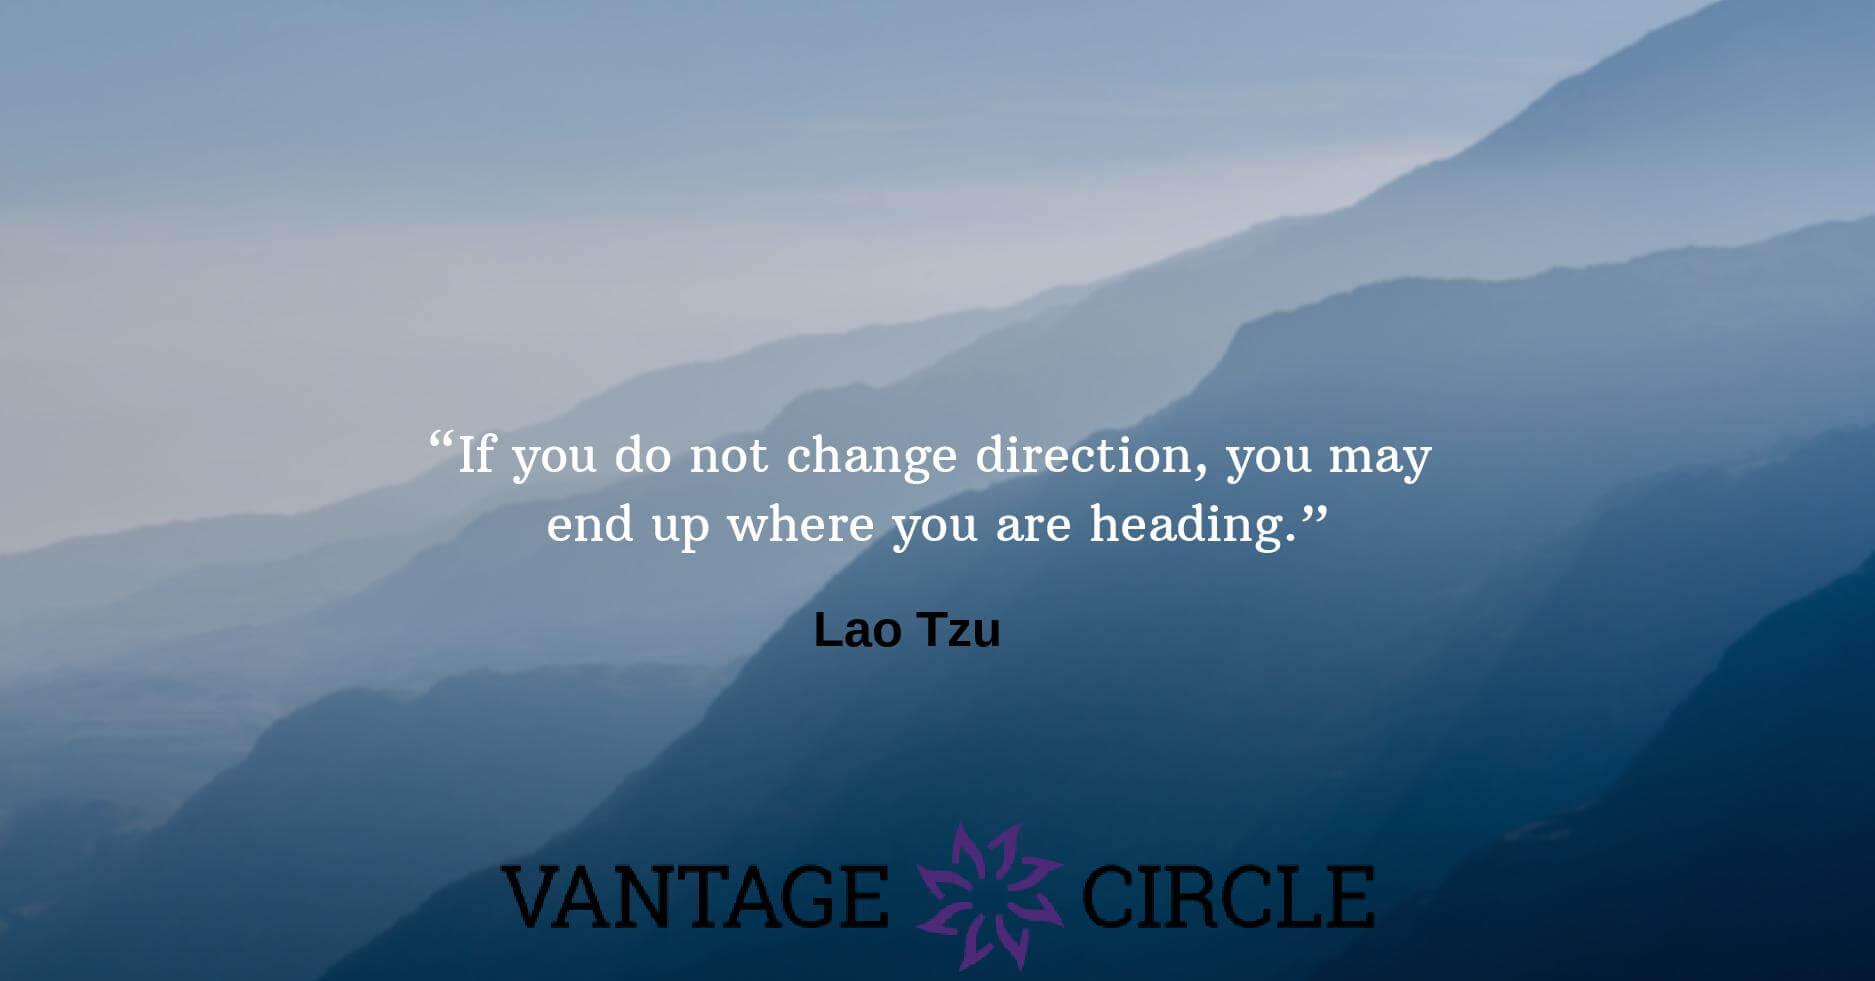 Employee-motivational-quotes-lao-tzu